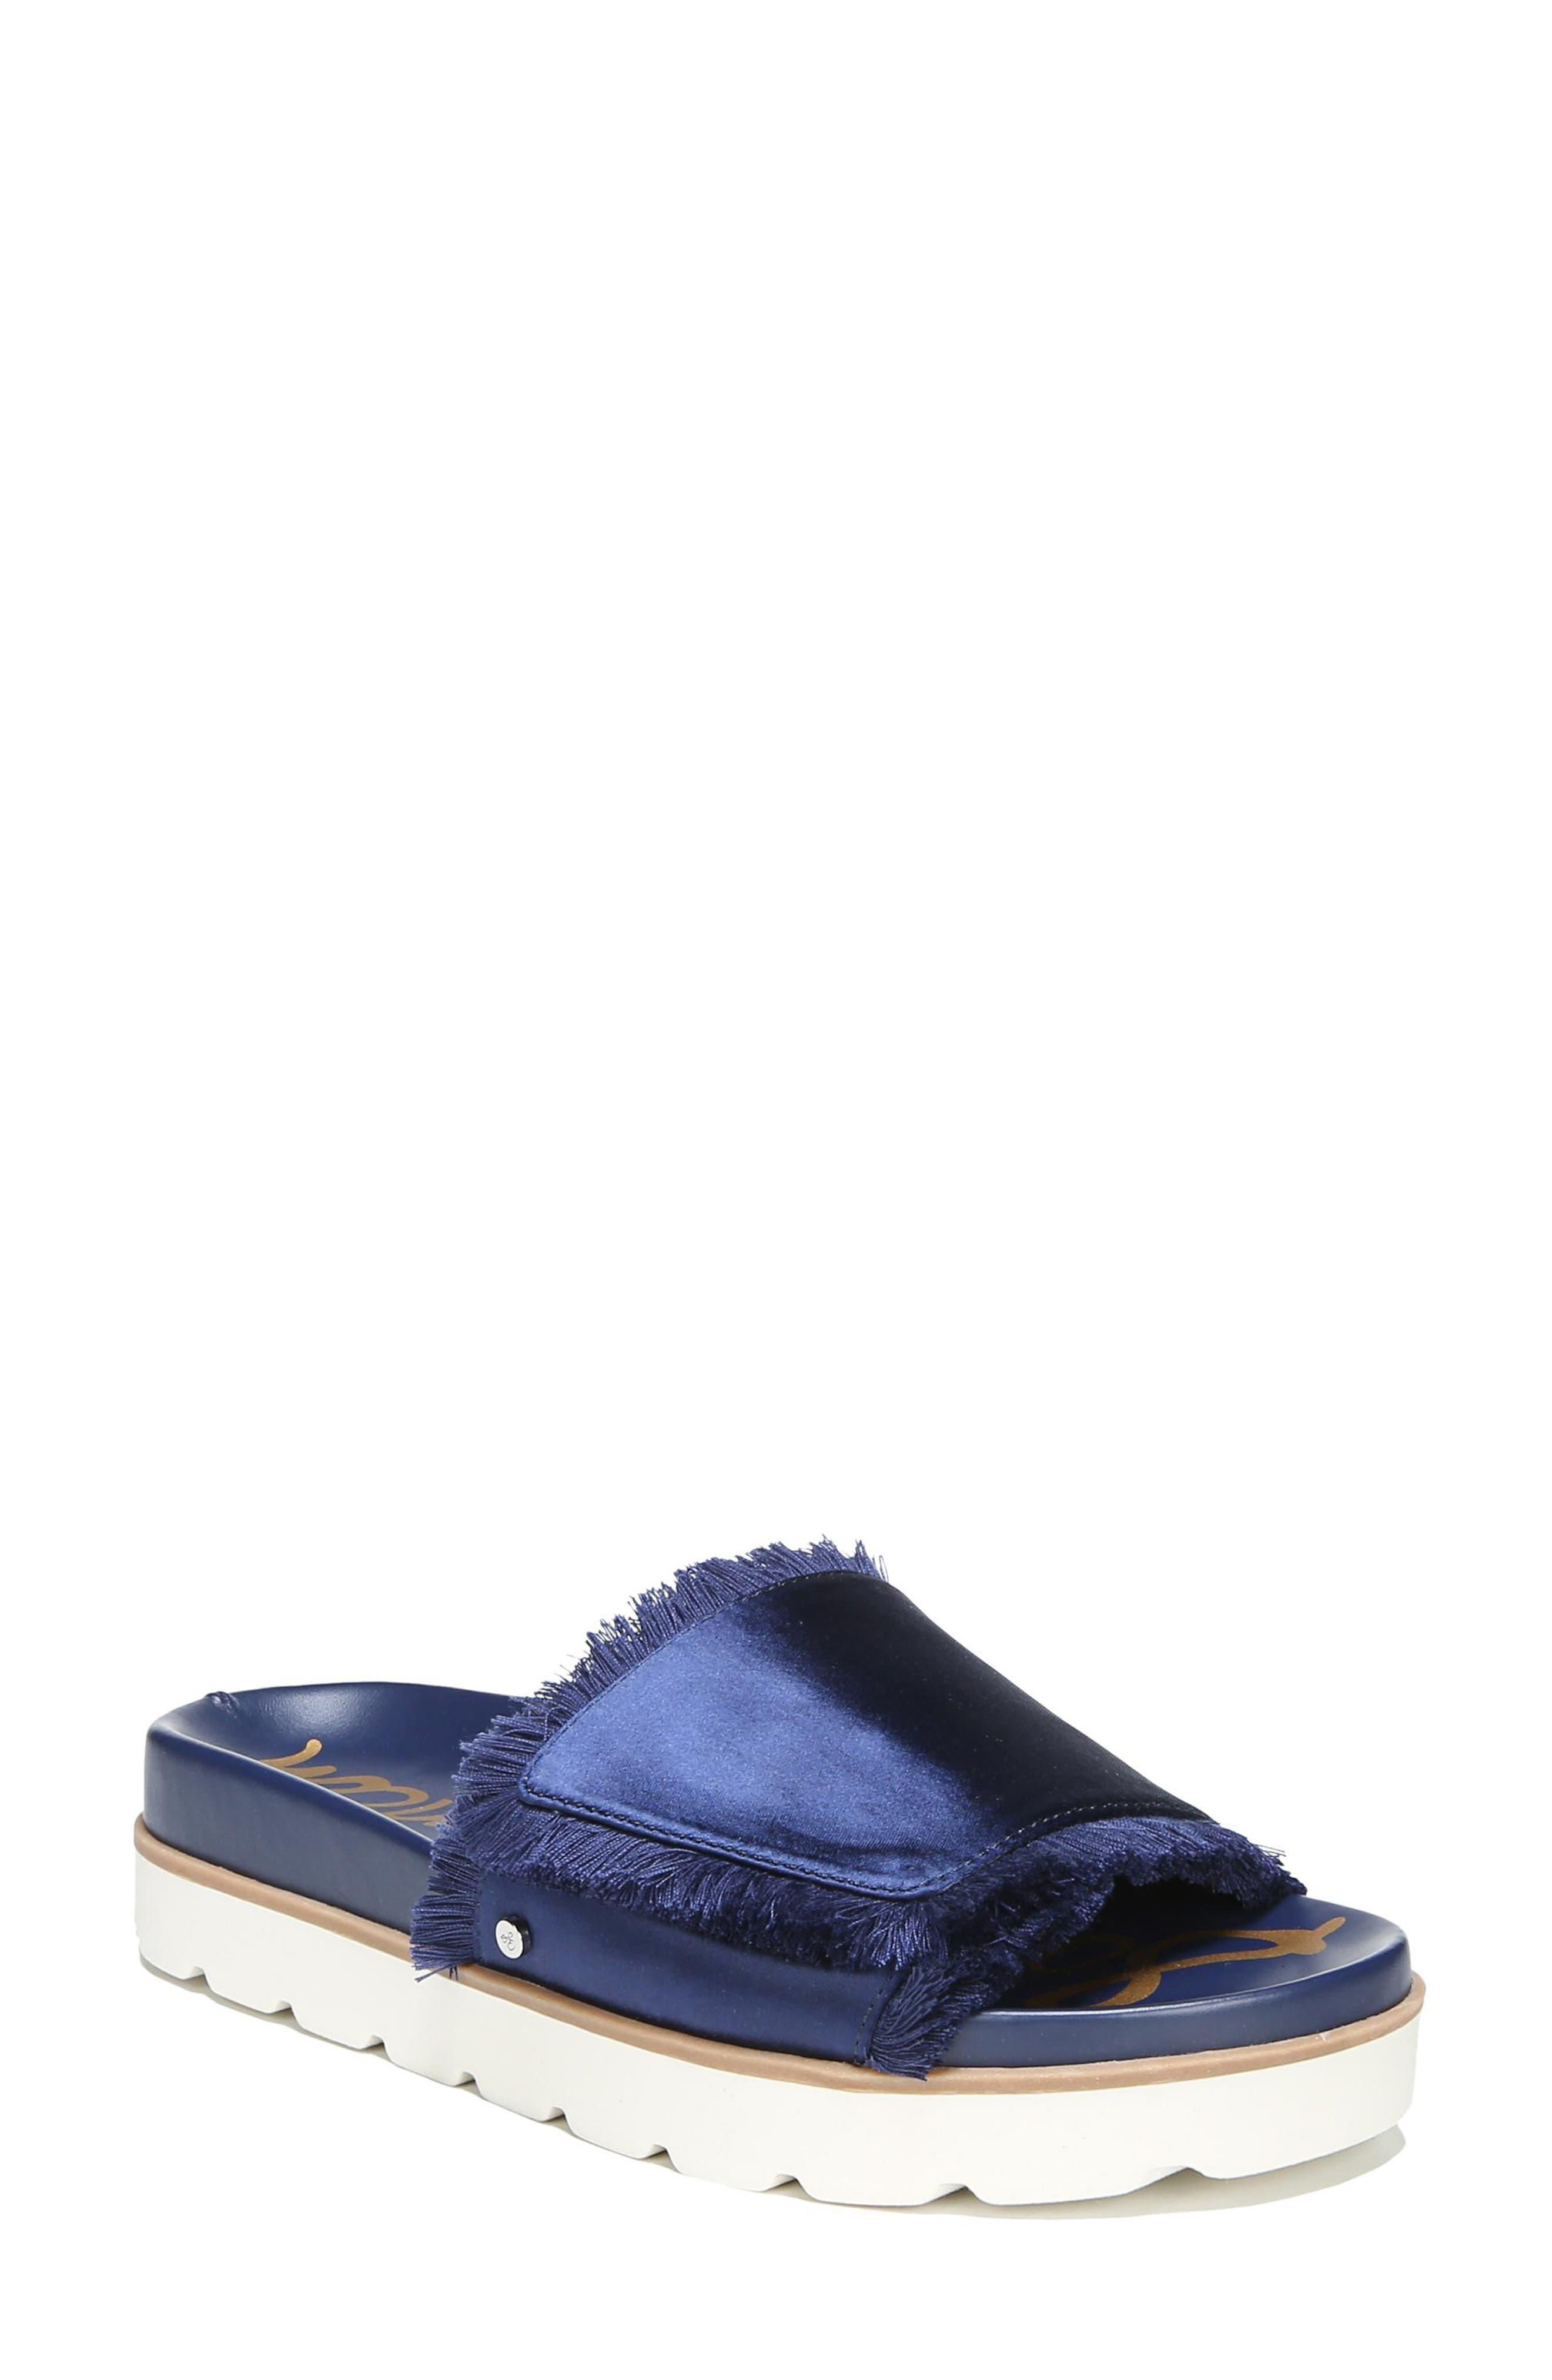 Mares Slide Sandal,                         Main,                         color, Poseidon Blue Satin